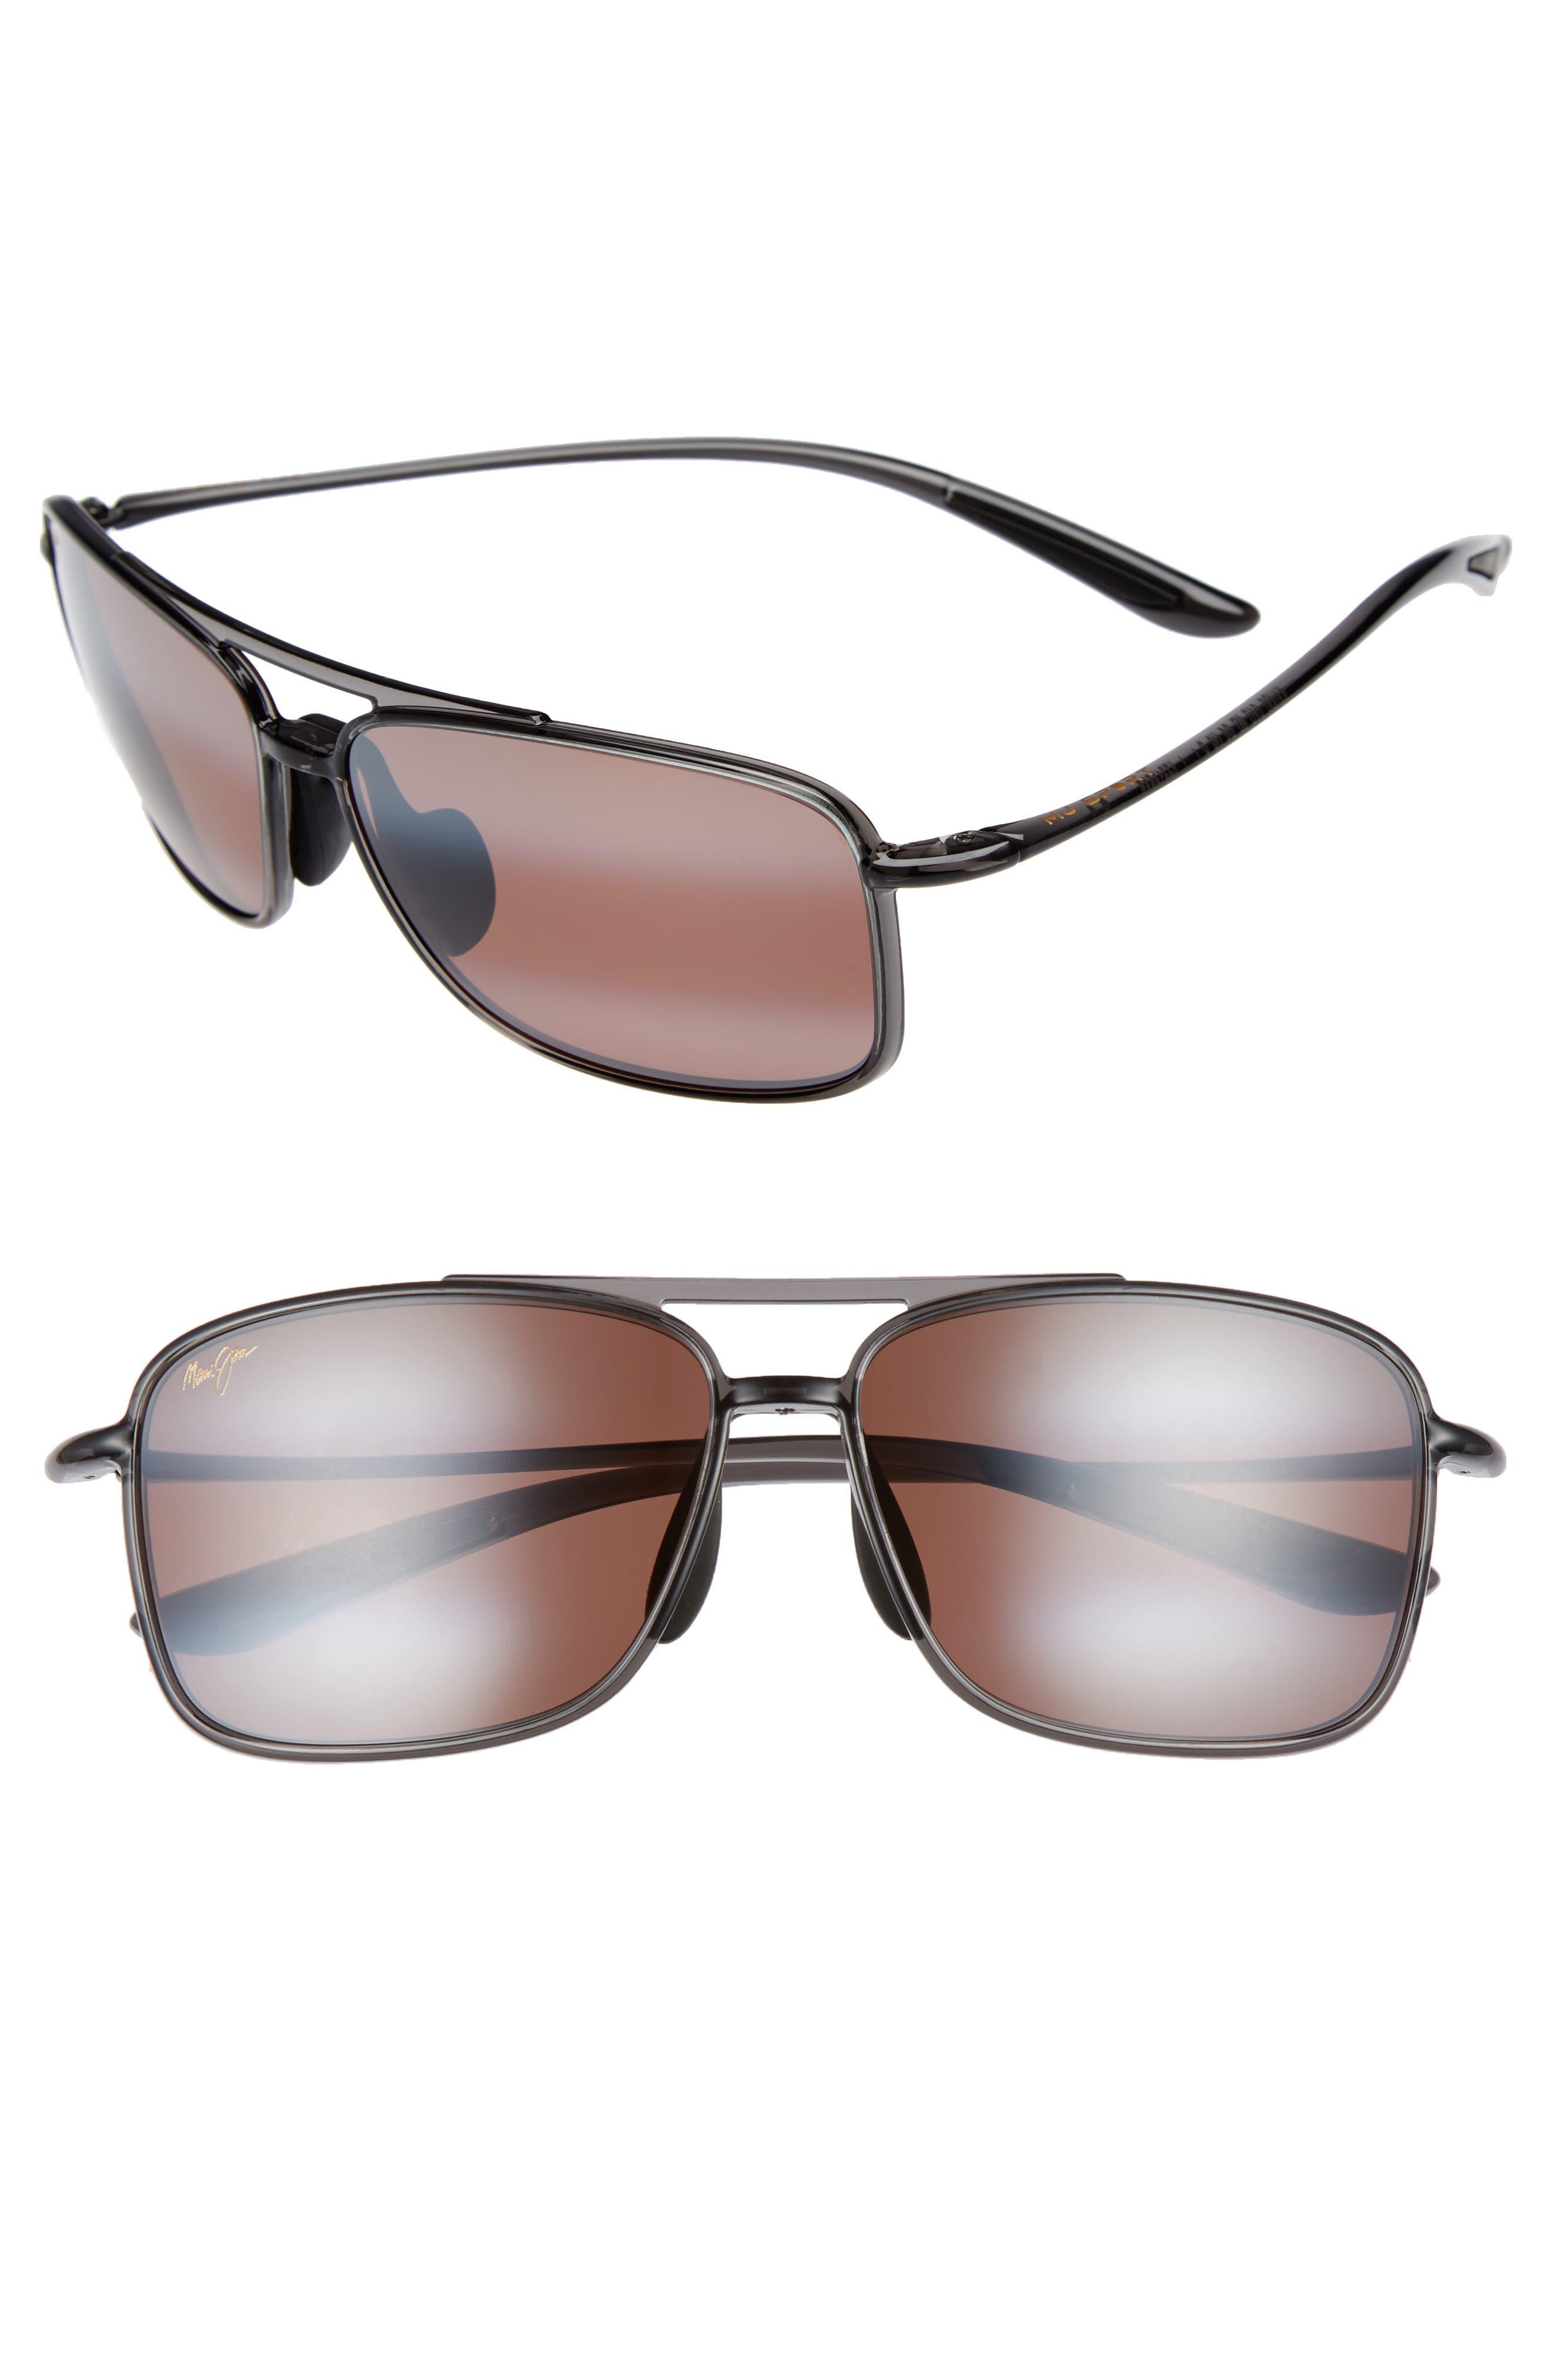 d91d47313e20a Maui Jim Kaupo Gap 61Mm Polarizedplus2 Sunglasses - Smoke Grey  Maui Rose